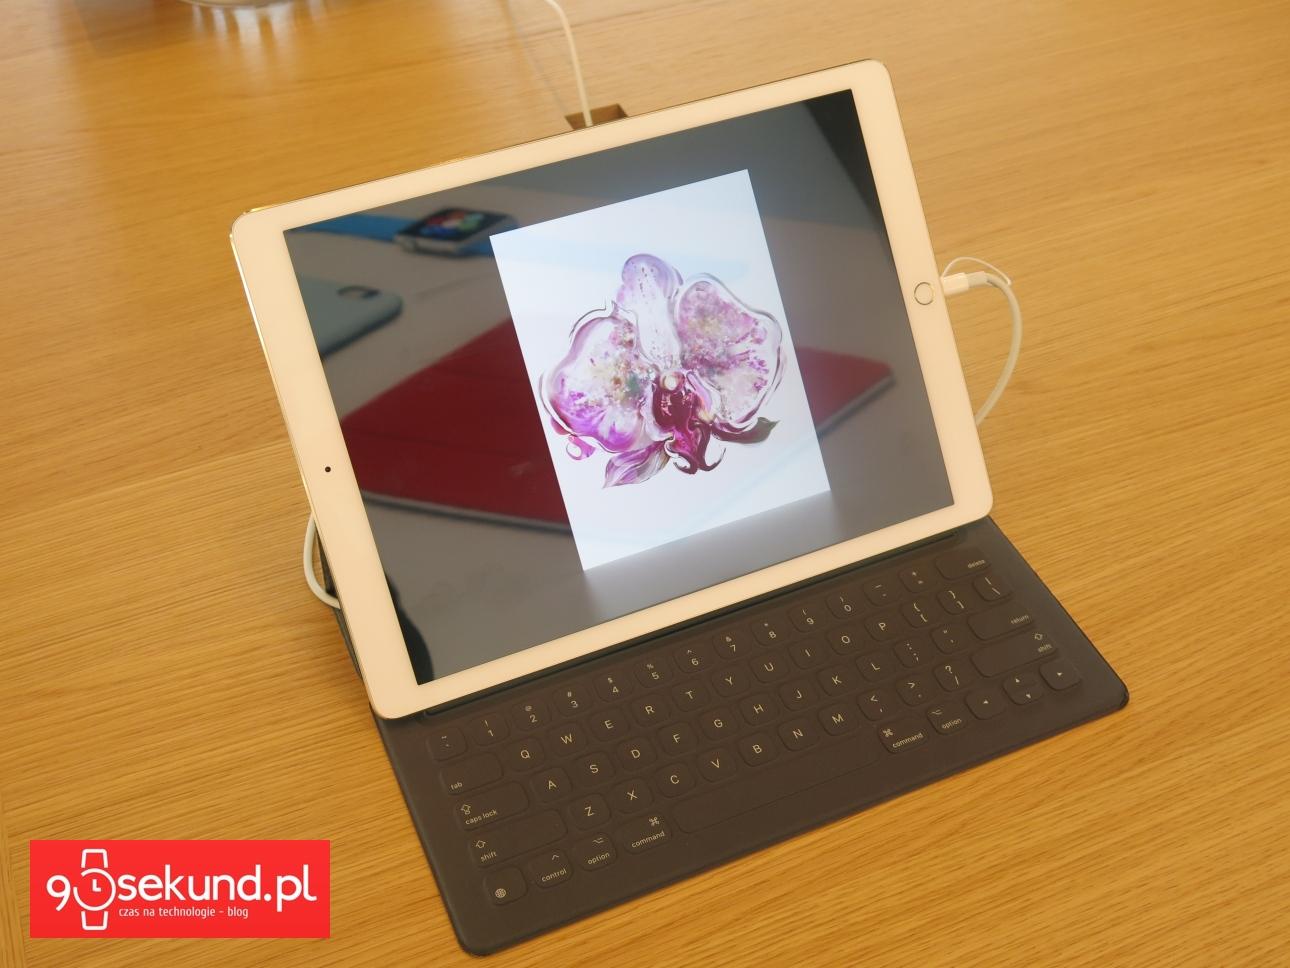 Apple iPad Pro - 90sekund.pl